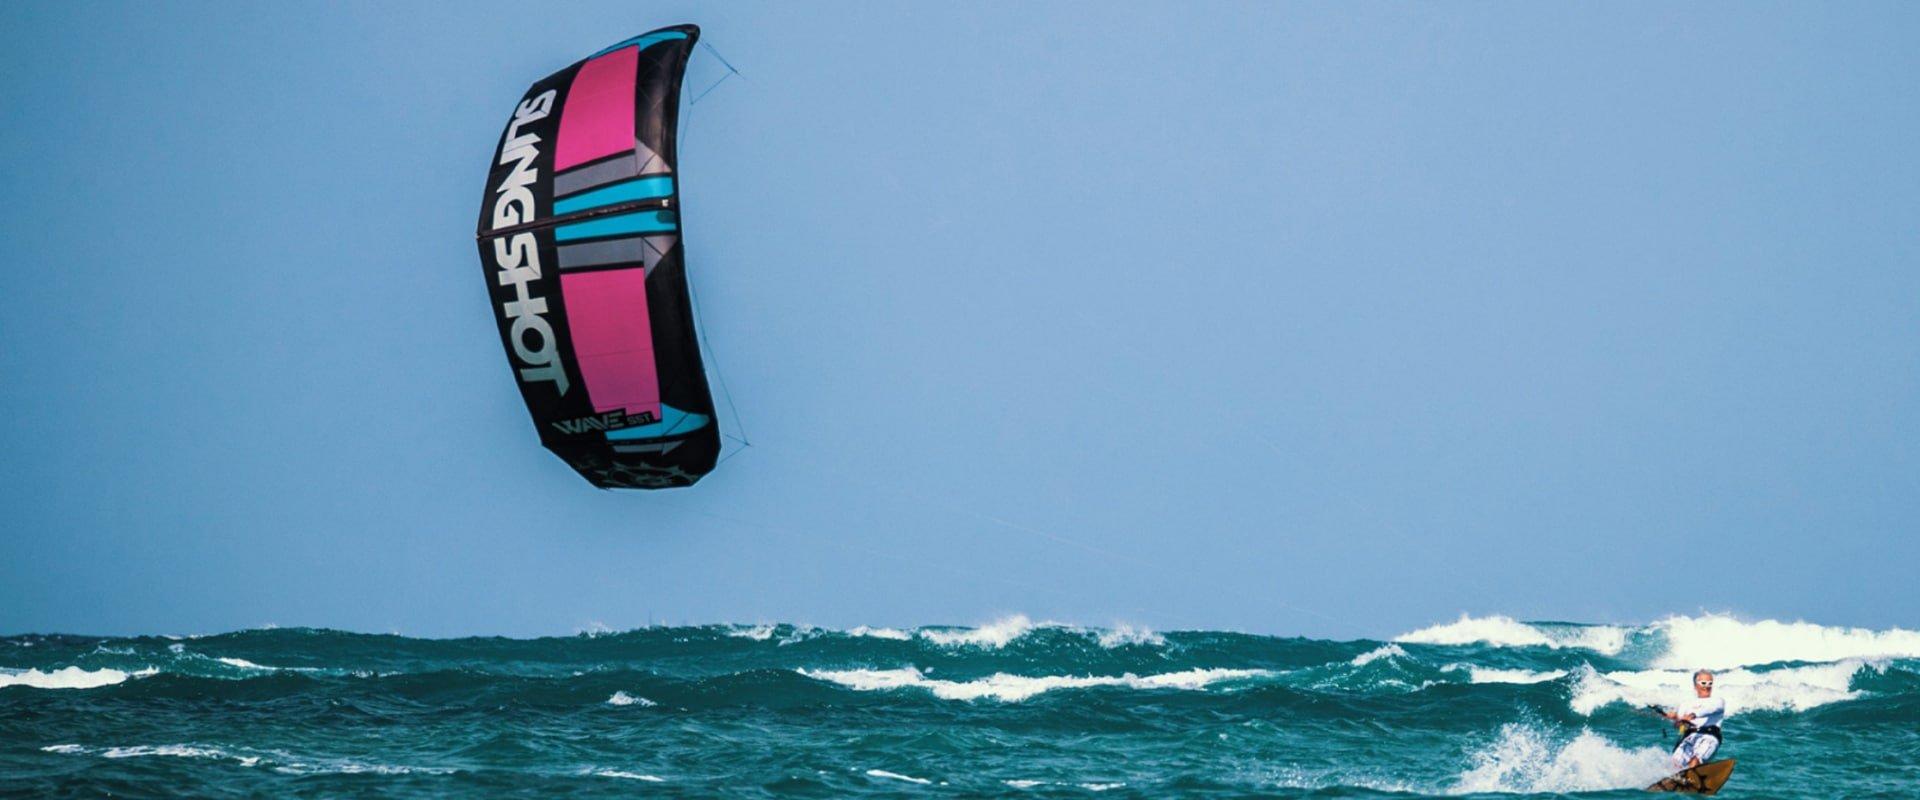 Delight in some kitesurfing